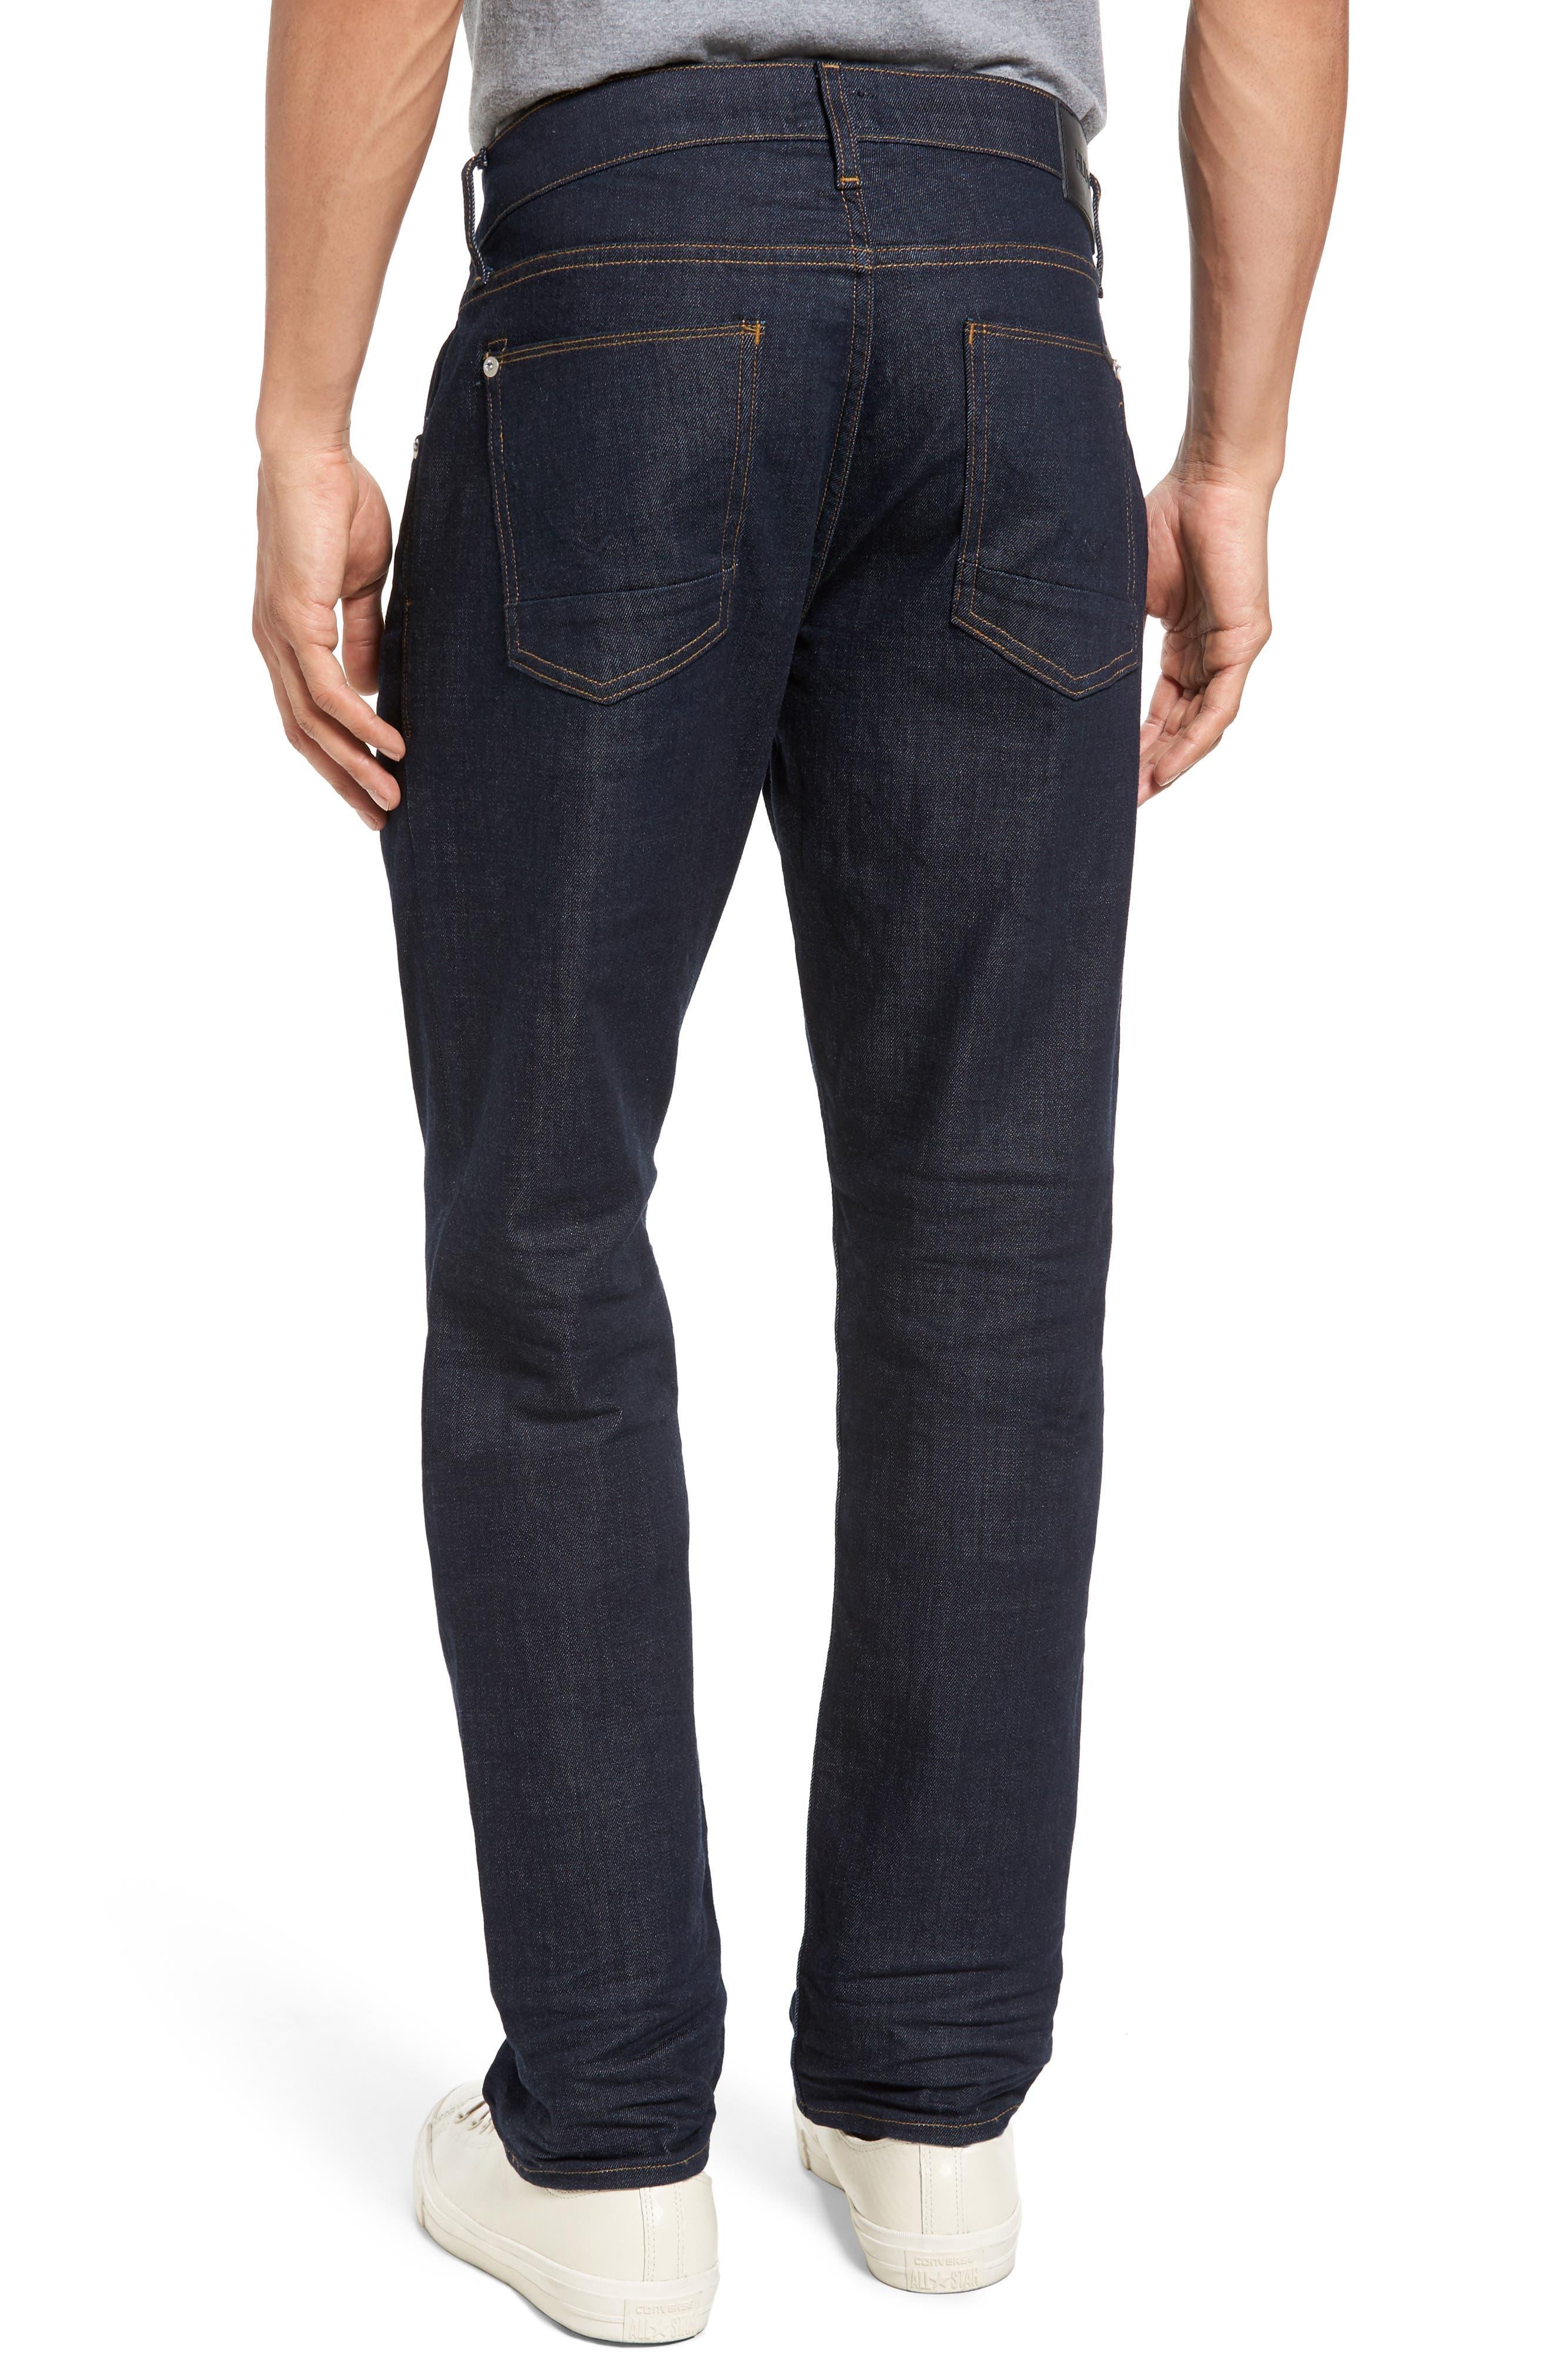 Blake Slim Fit Jeans,                             Alternate thumbnail 2, color,                             410